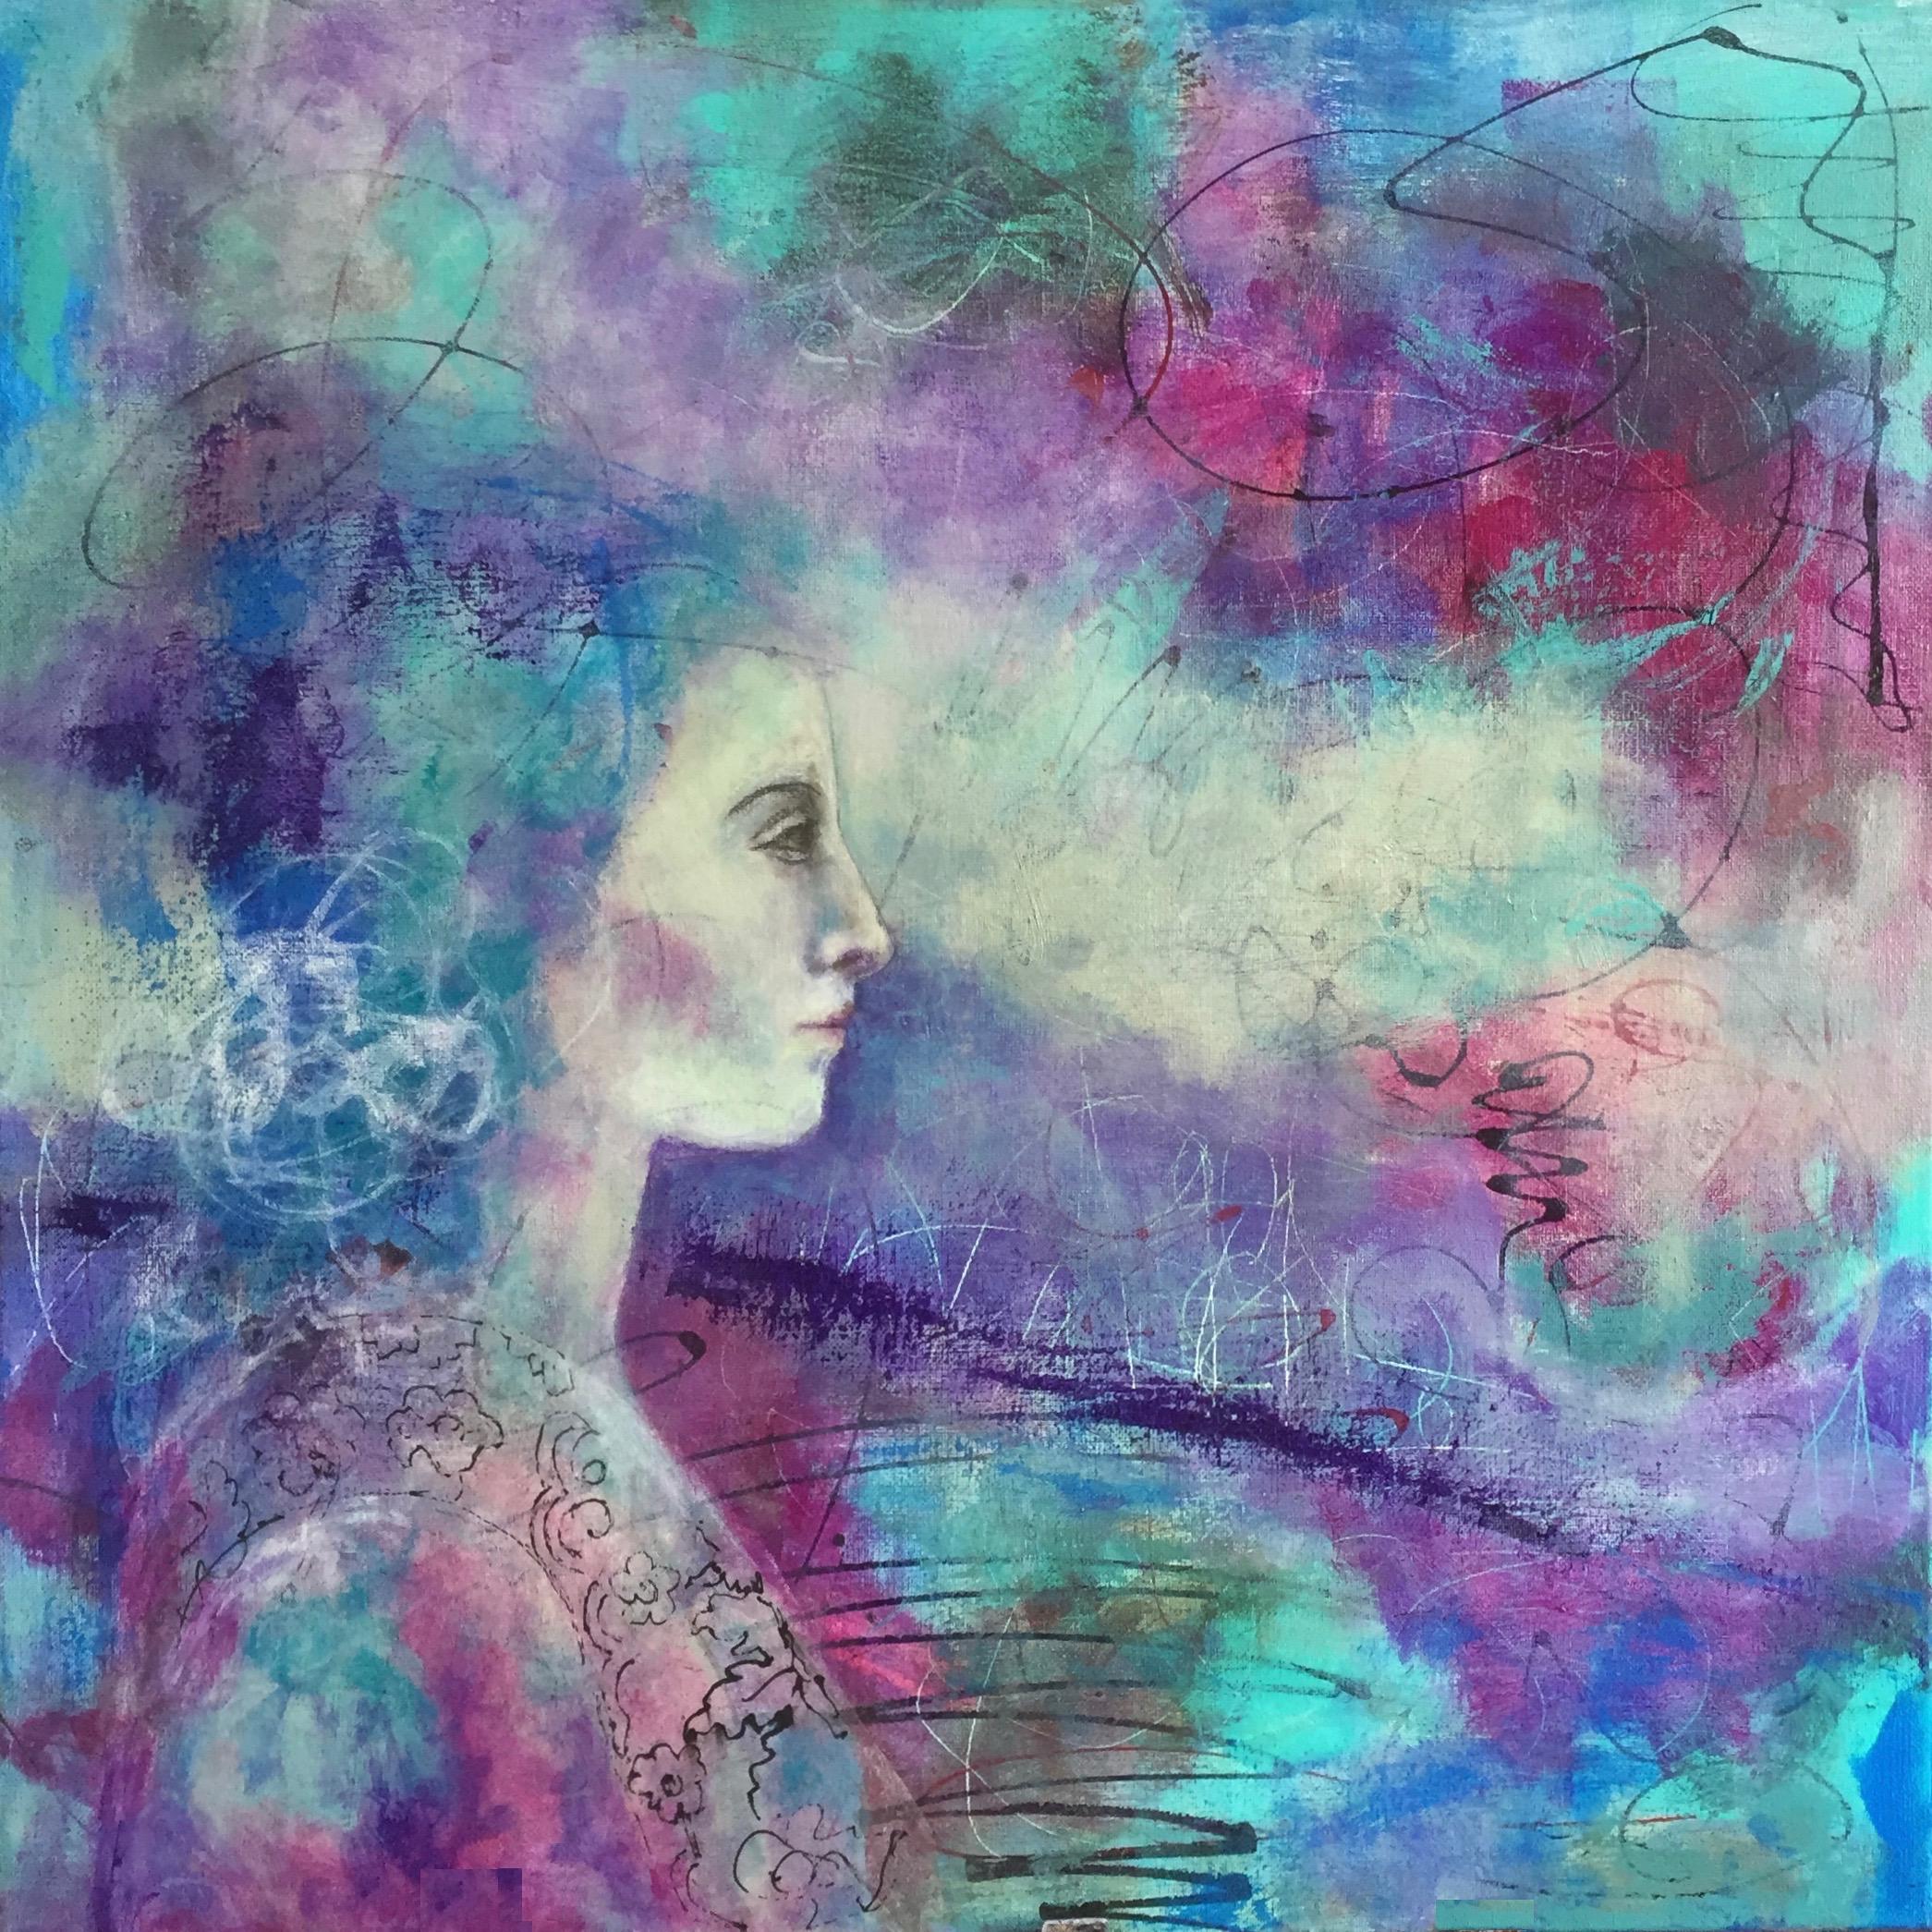 © 2017 Dora Williams Fine Art, All rights reserved.